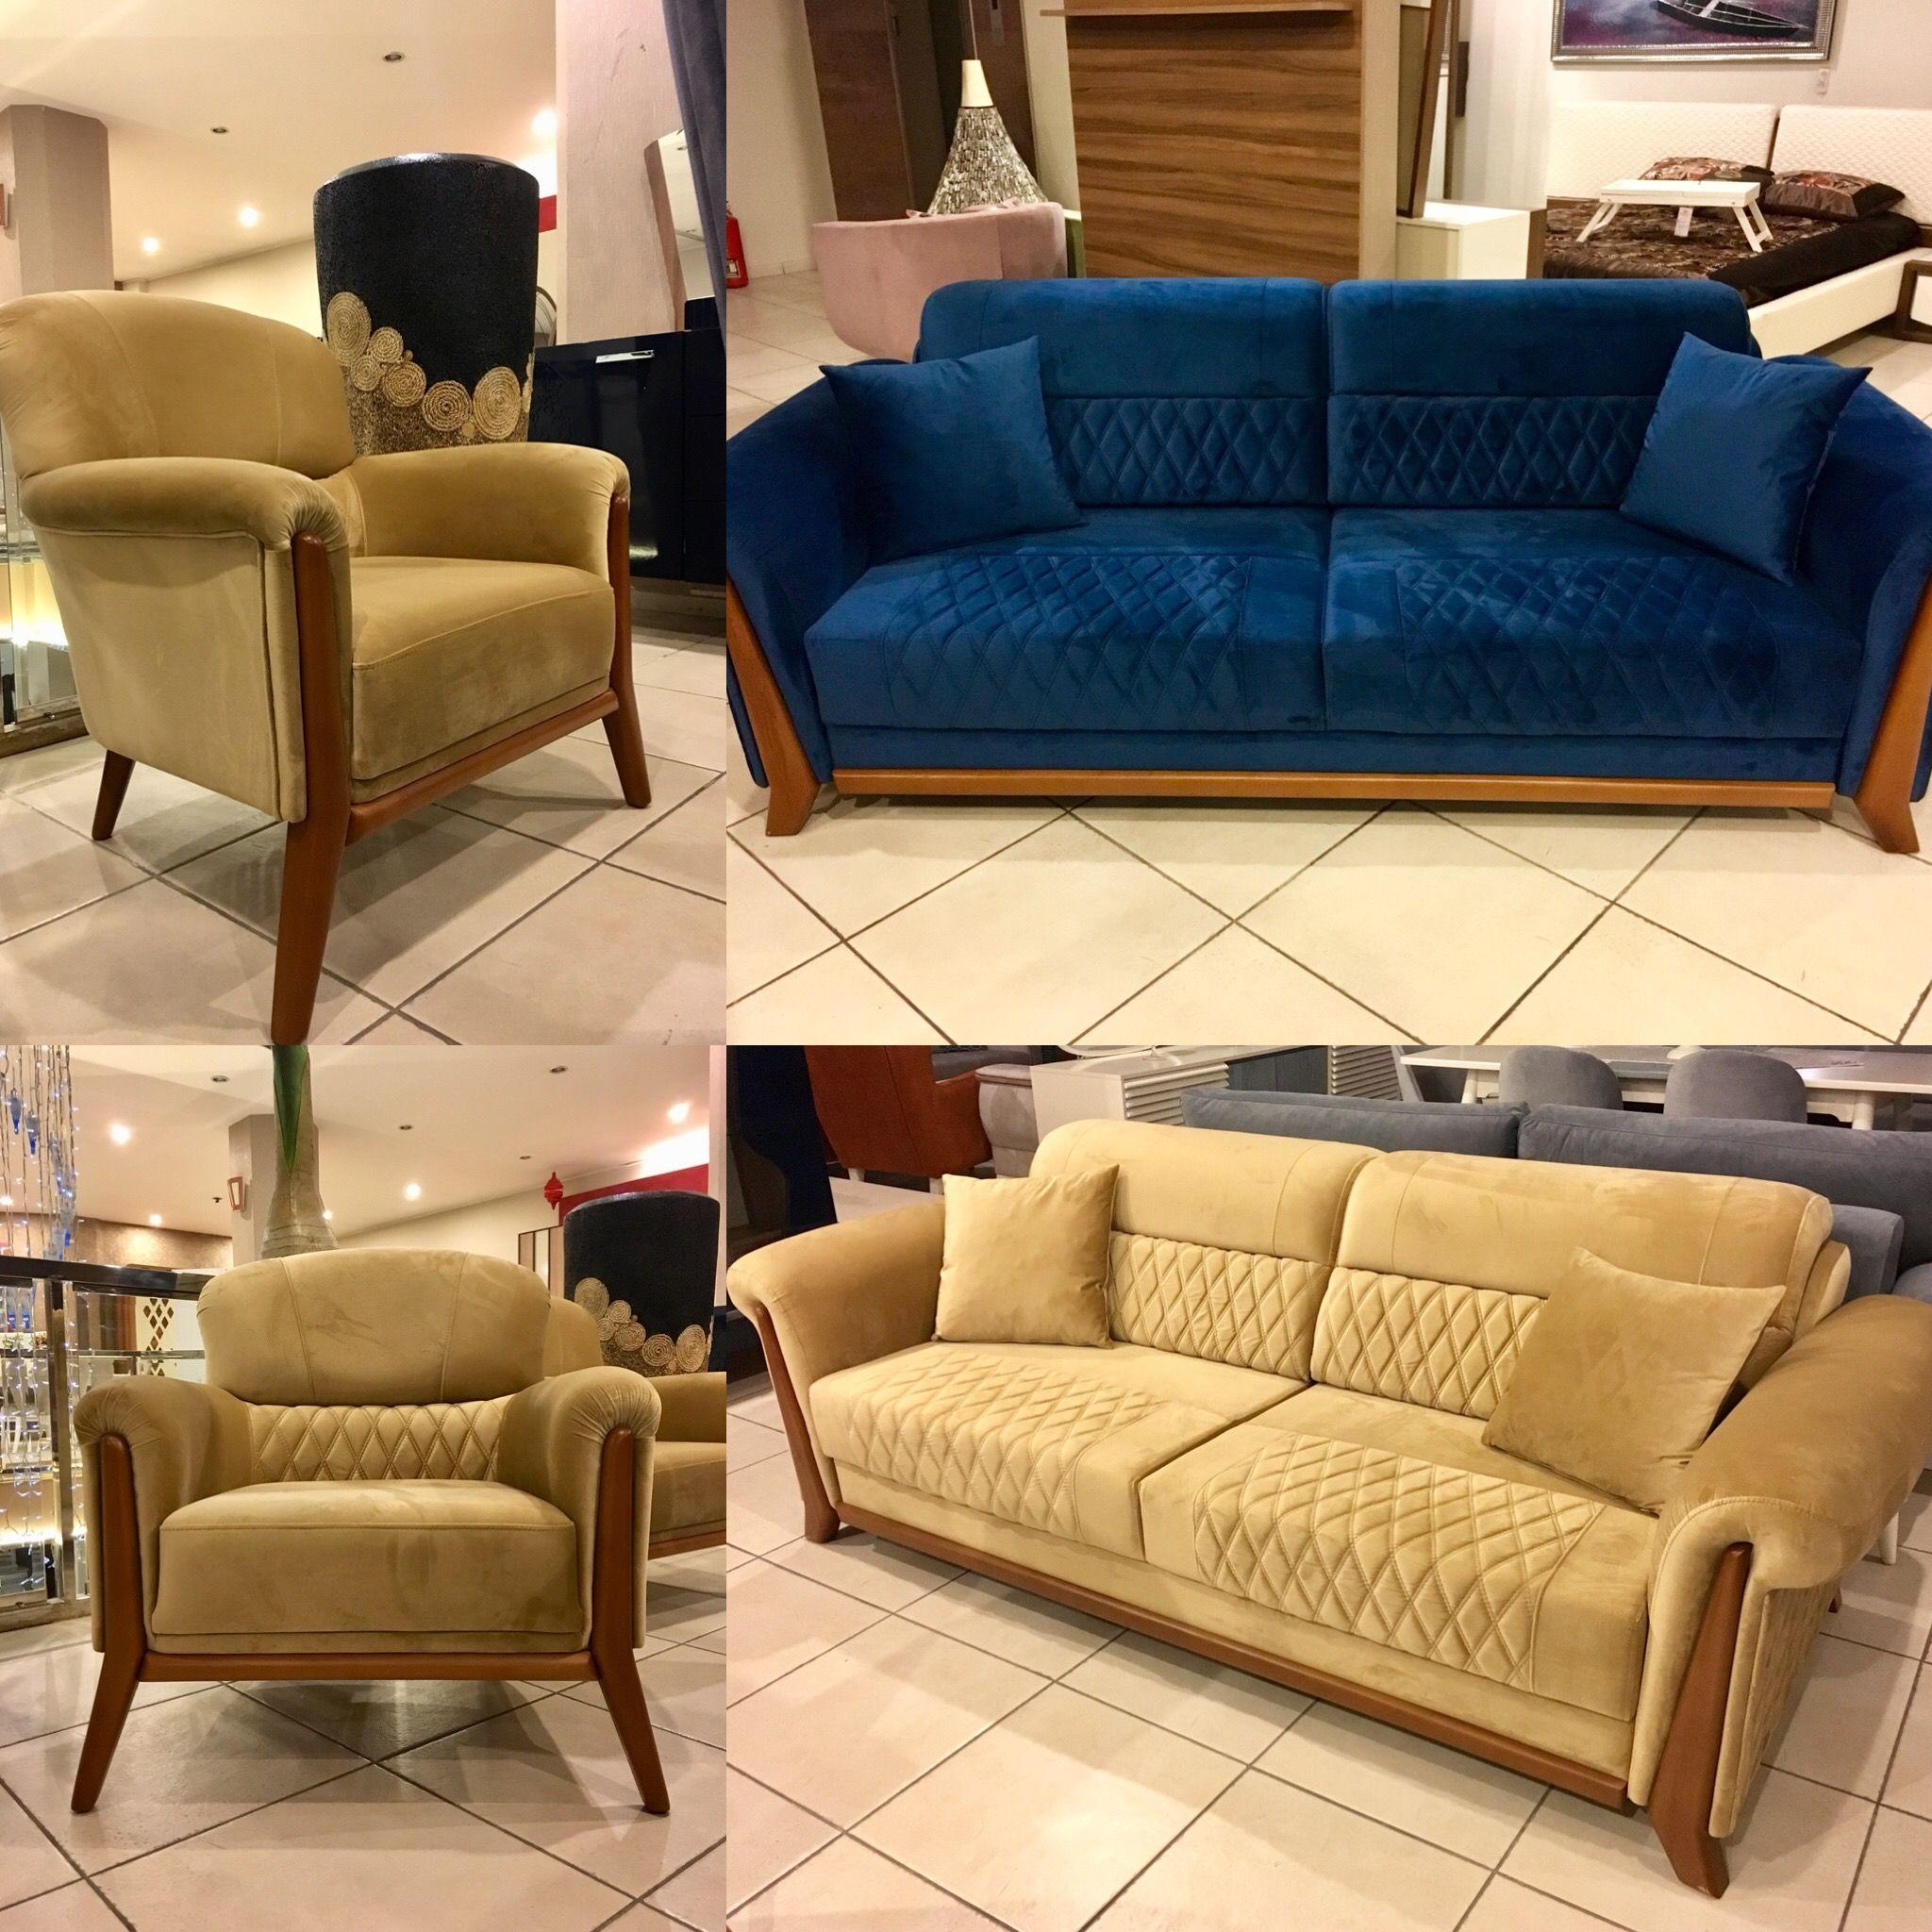 Pin By Alex On Turkmenoglu Koltuk Takimlari Sofa And Living Room Sets Sofa Set Furniture Sofa Design